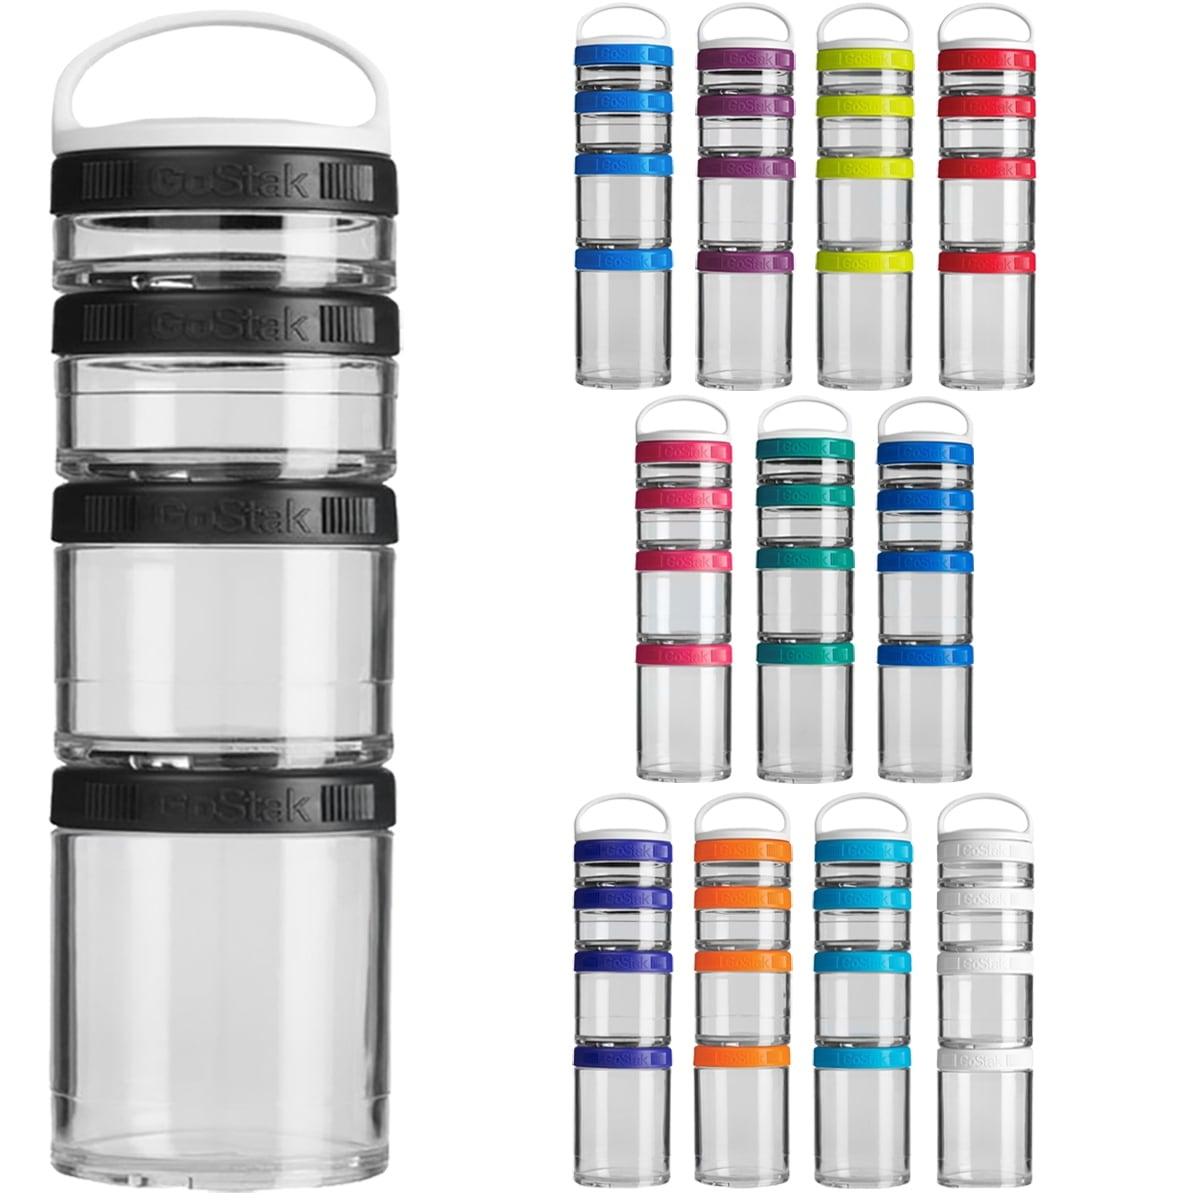 Shop Blender Bottle GoStak Starter 4Pak Twist n\' Lock Storage Jars ...